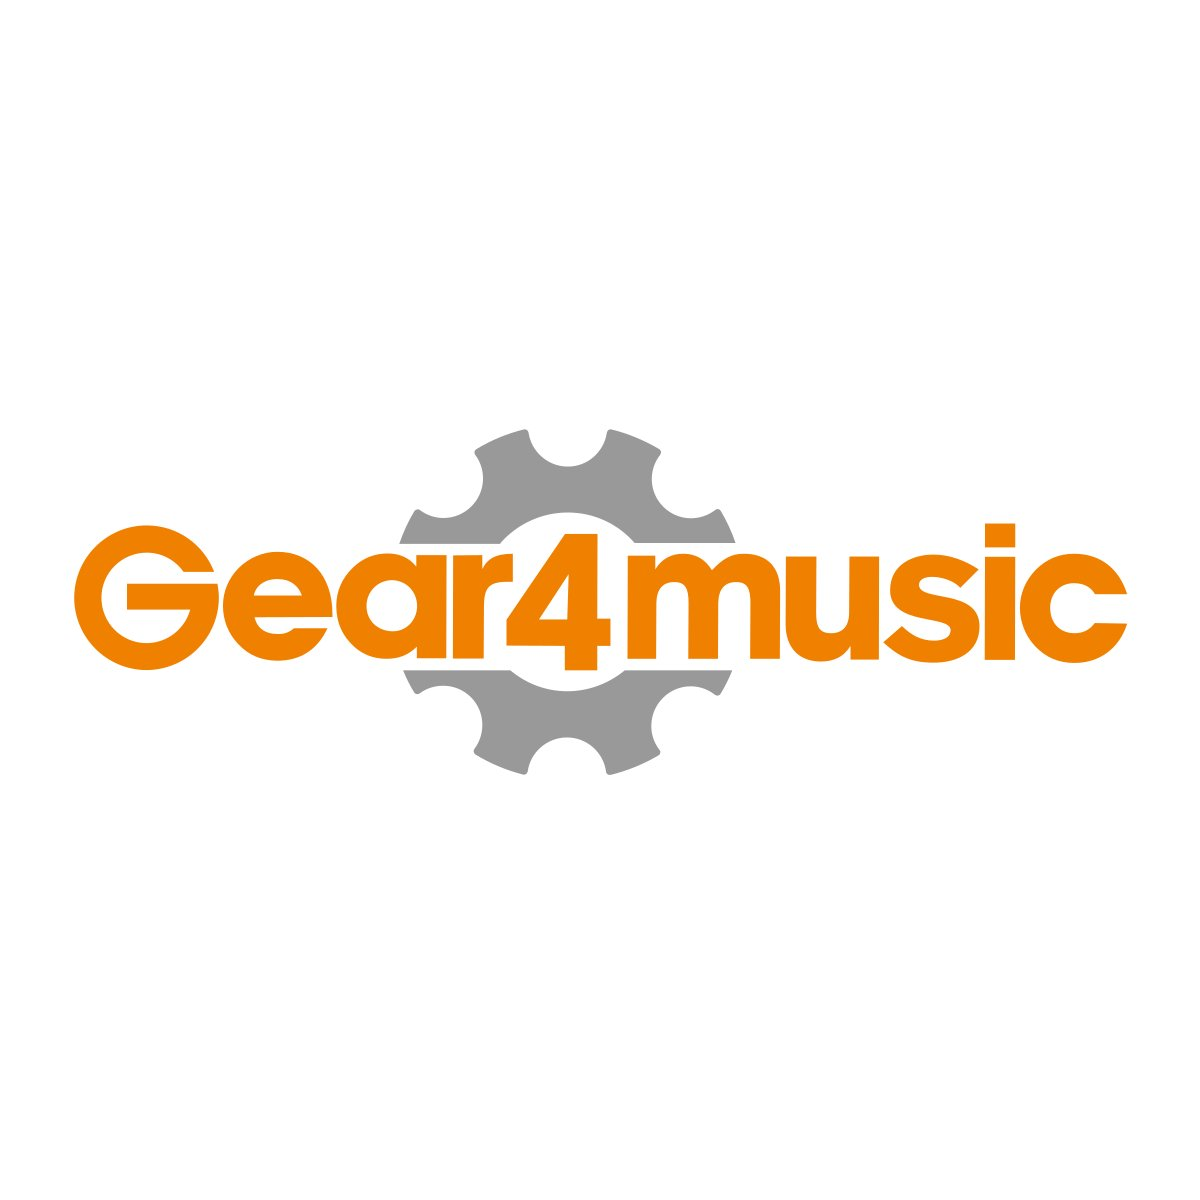 66733023837 MK-3000 Key-Lighting Keyboard by Gear4music at Gear4music